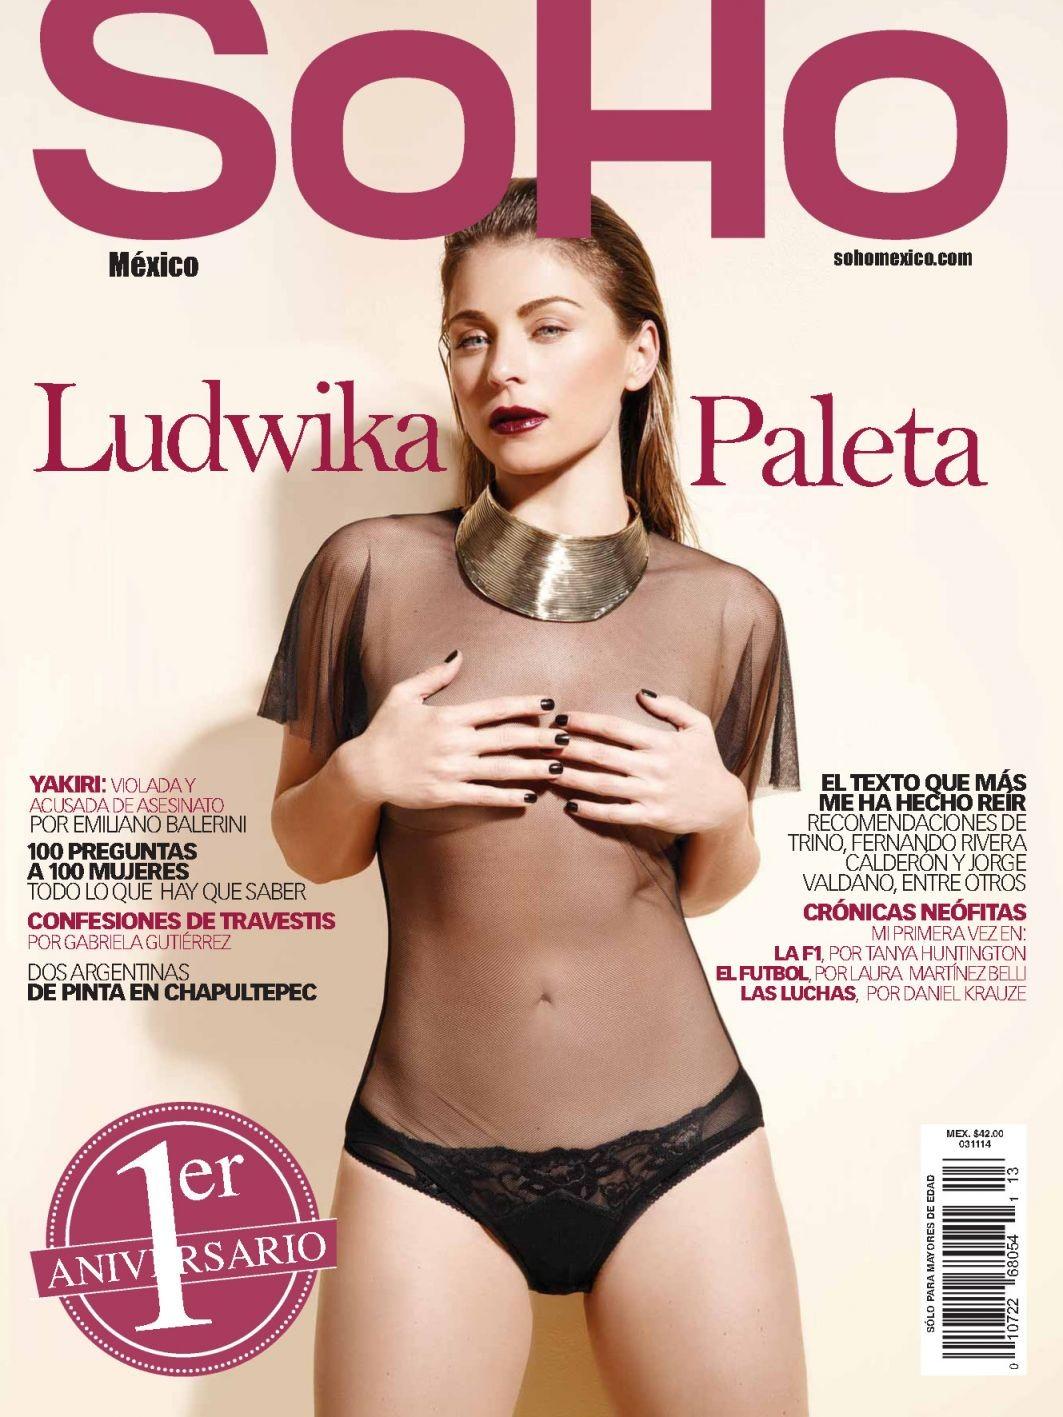 imagenes fakes de ludwika paleta desnuda